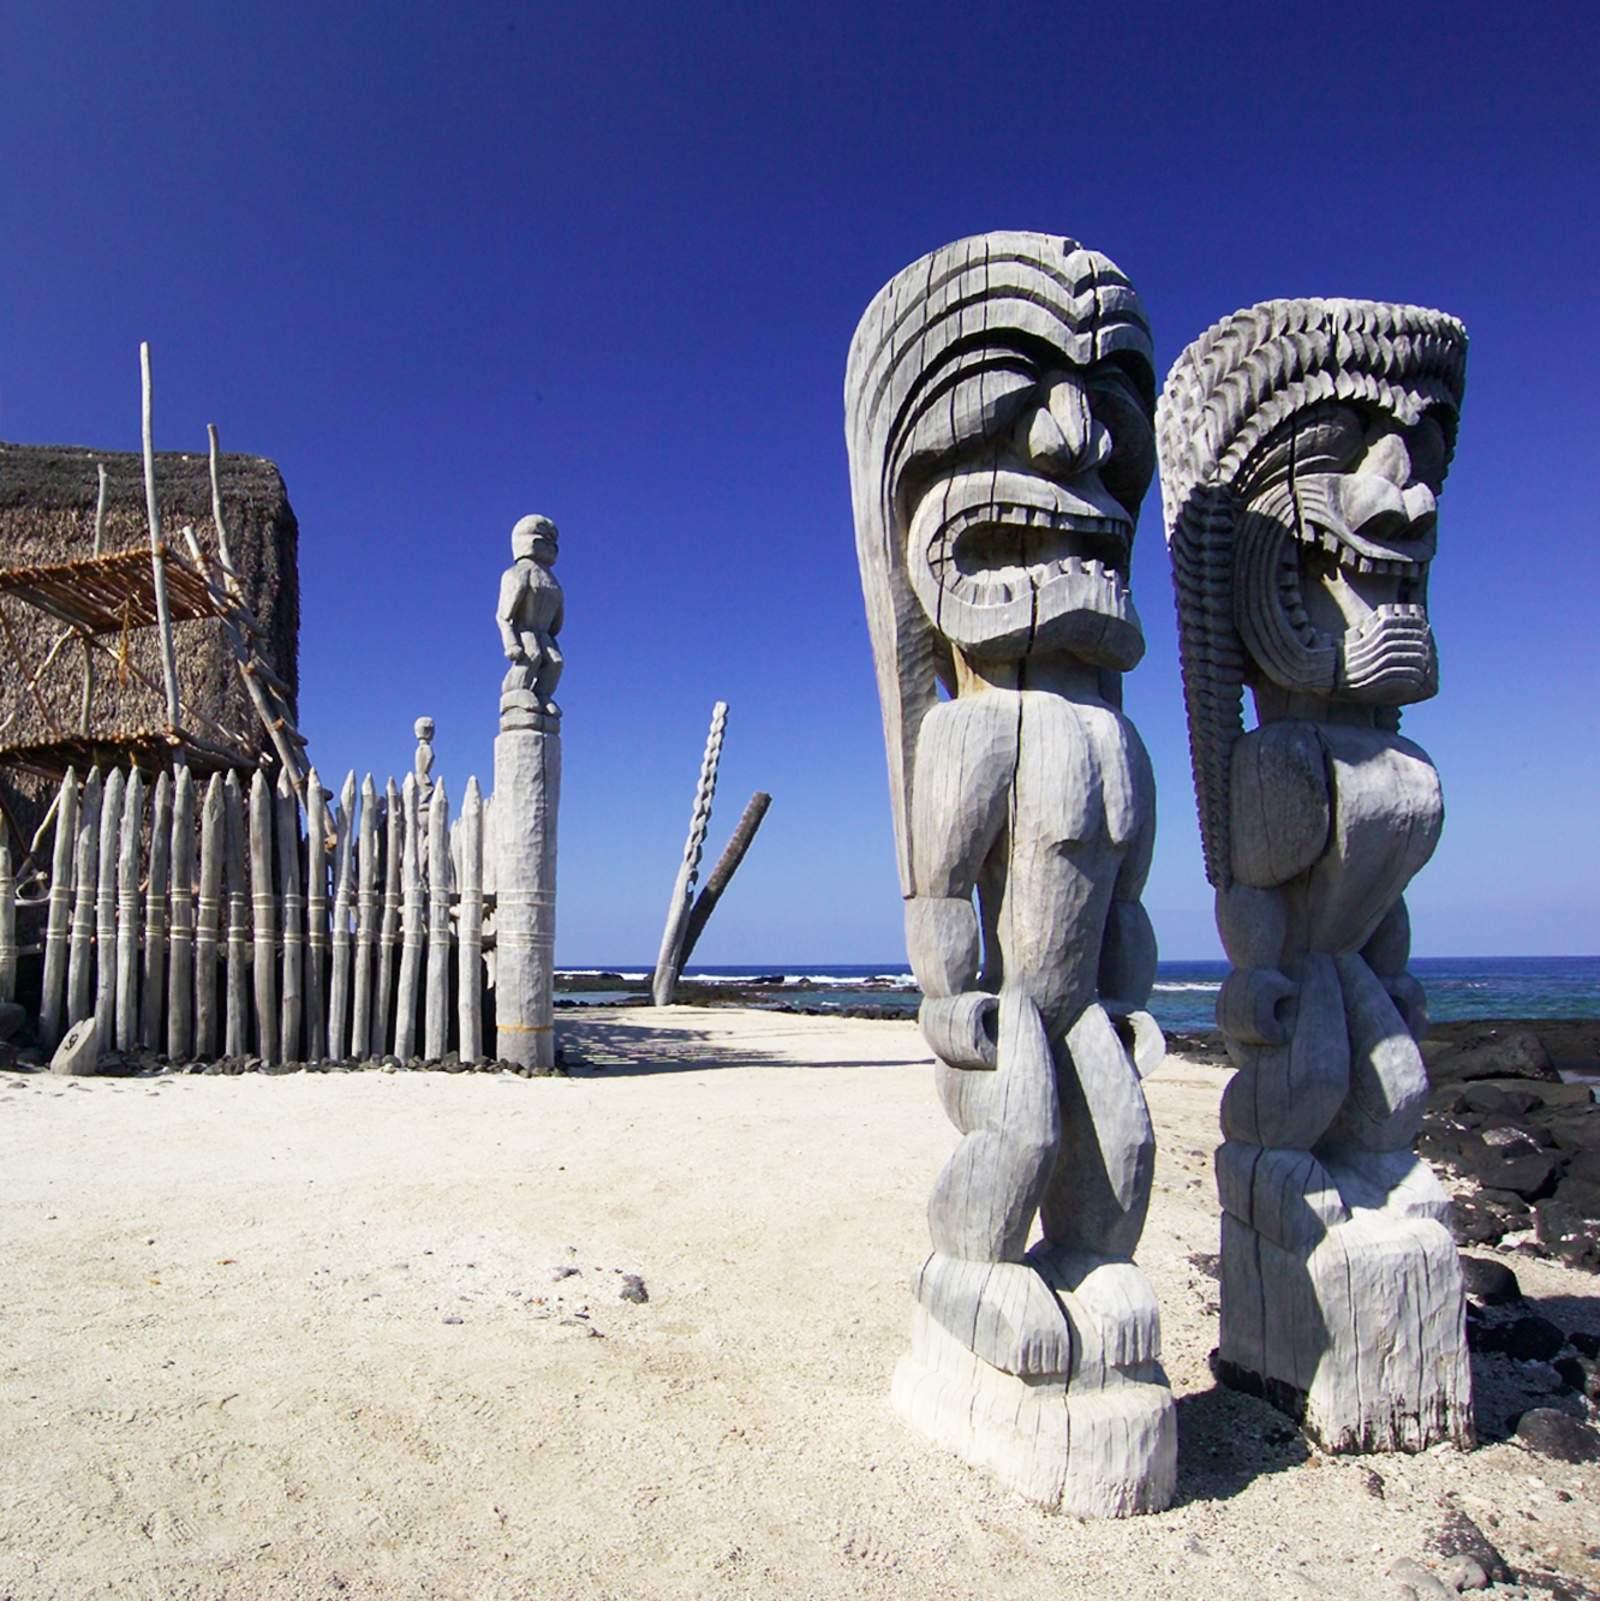 Pu'uhonua O Honaunau National Historical Park in Kailua-Kona, Big Island